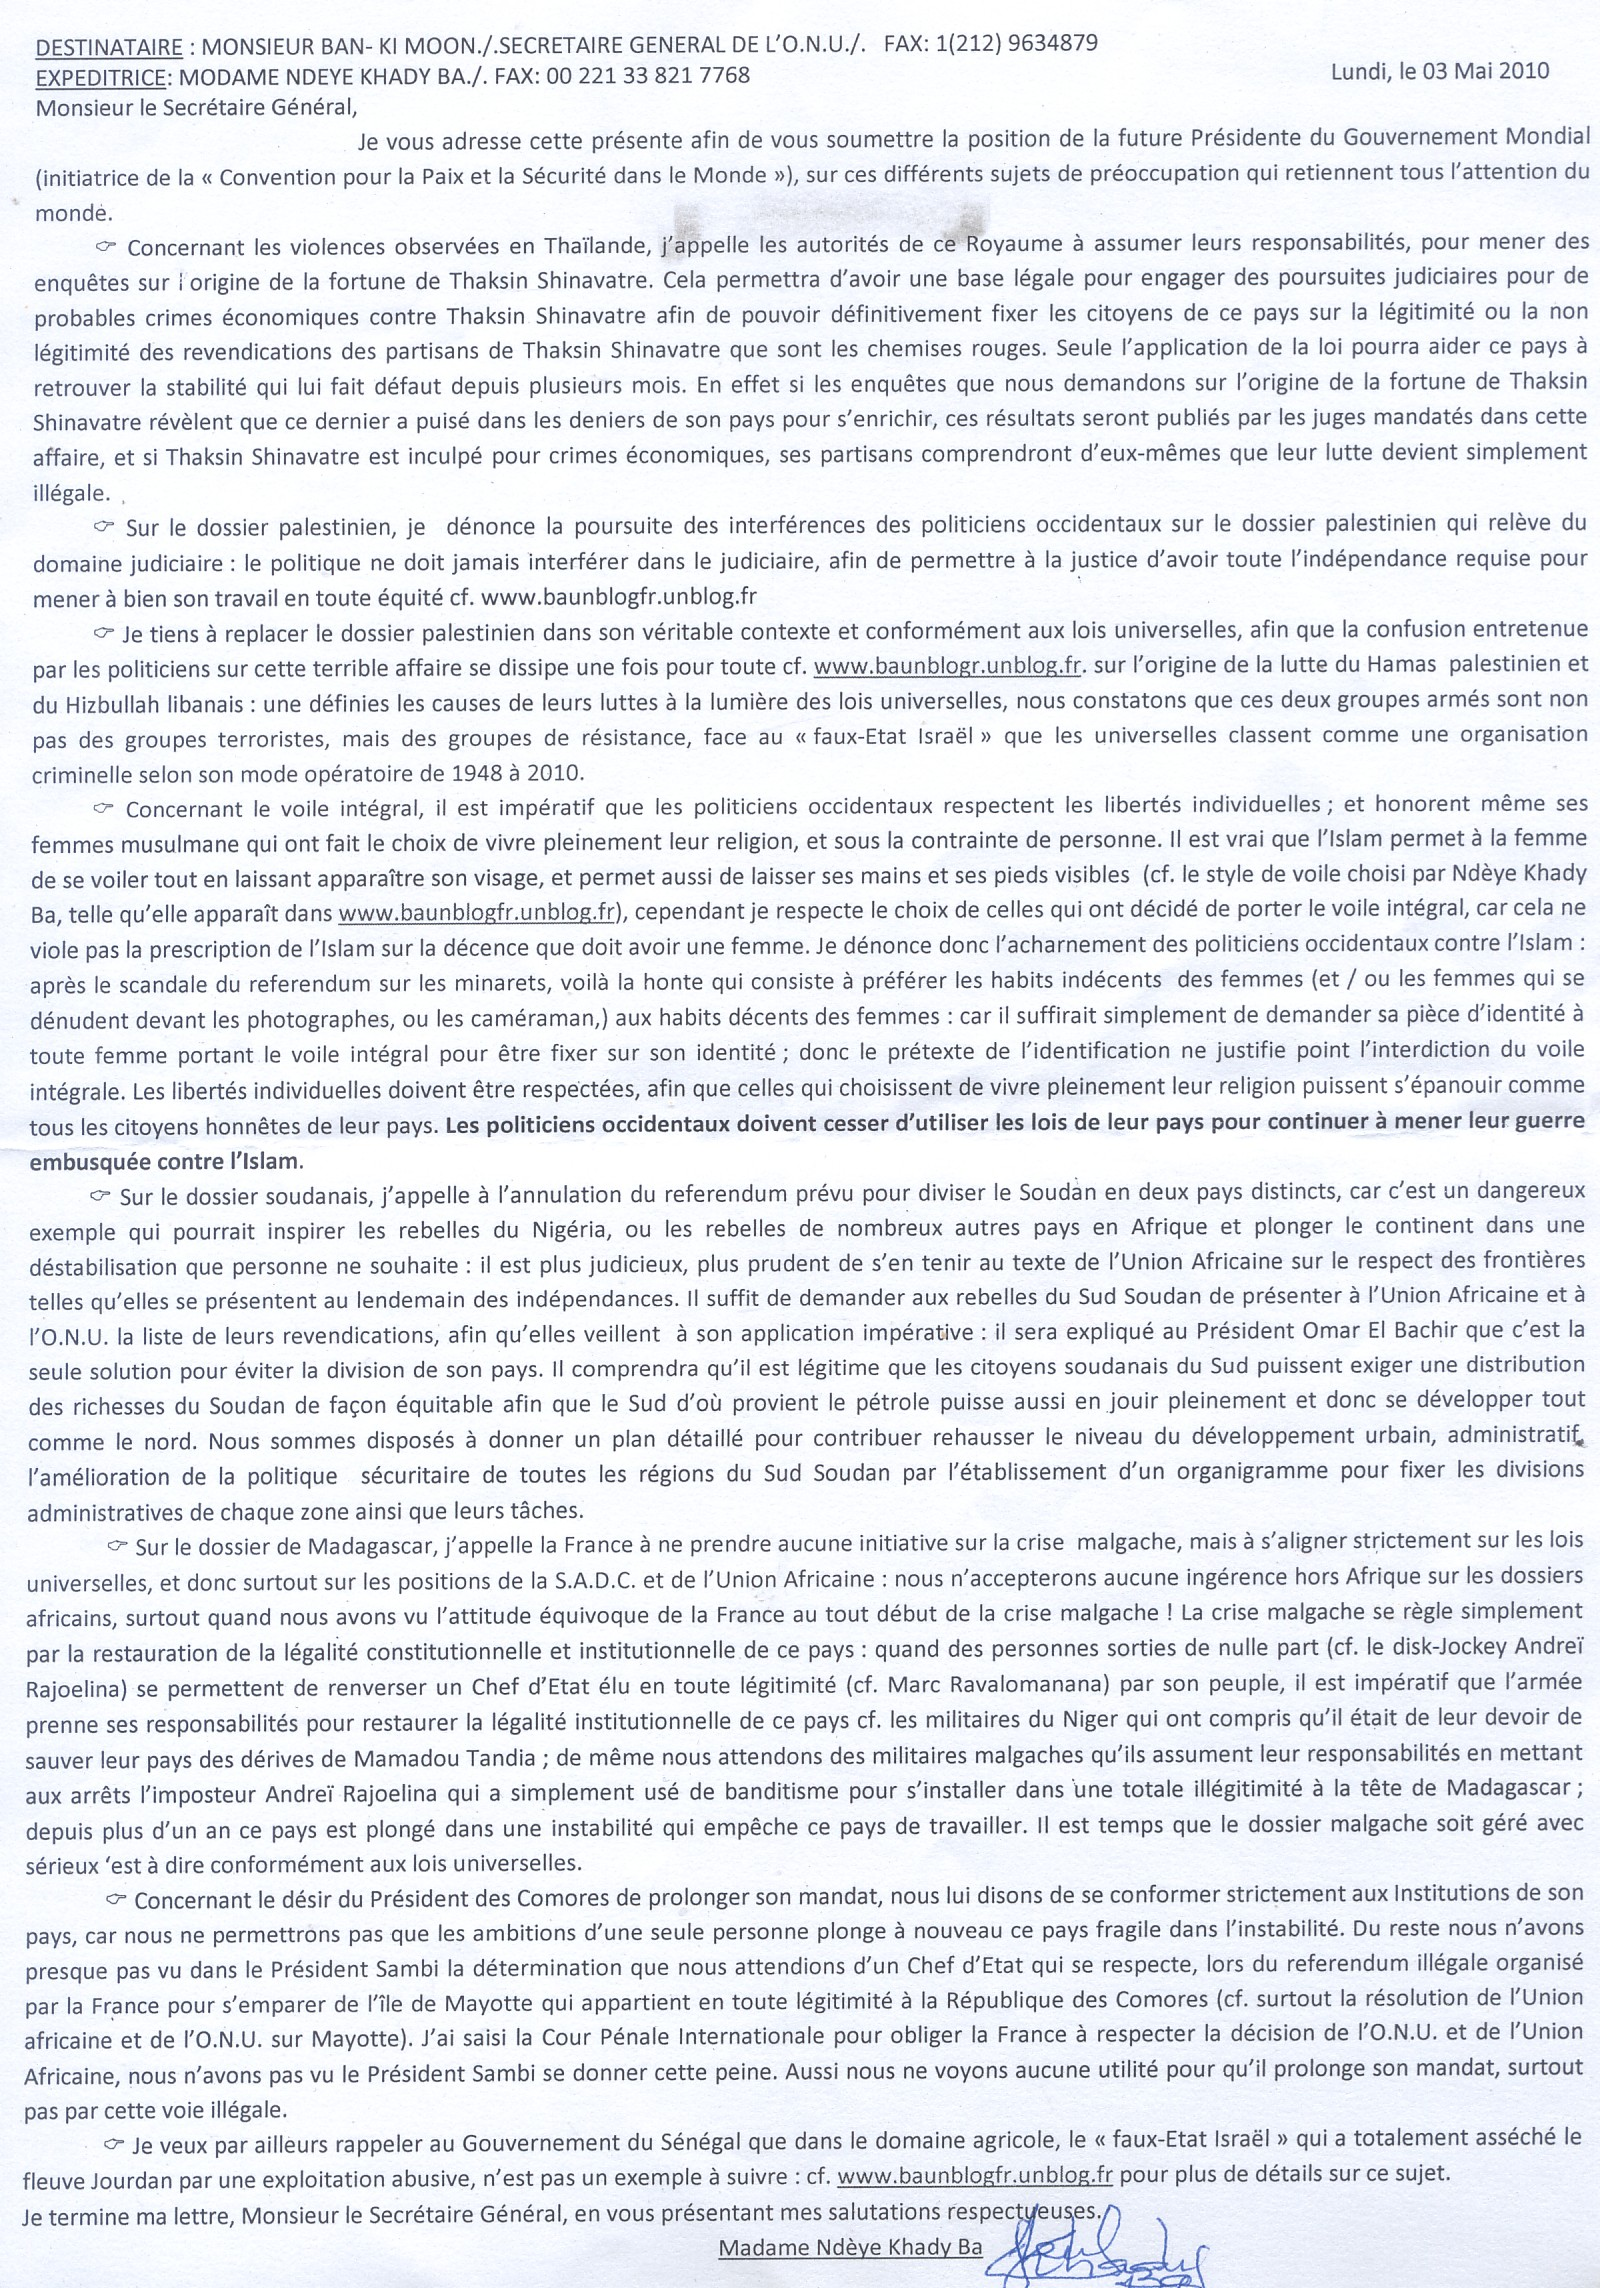 sanstitrenumrisation01.jpg